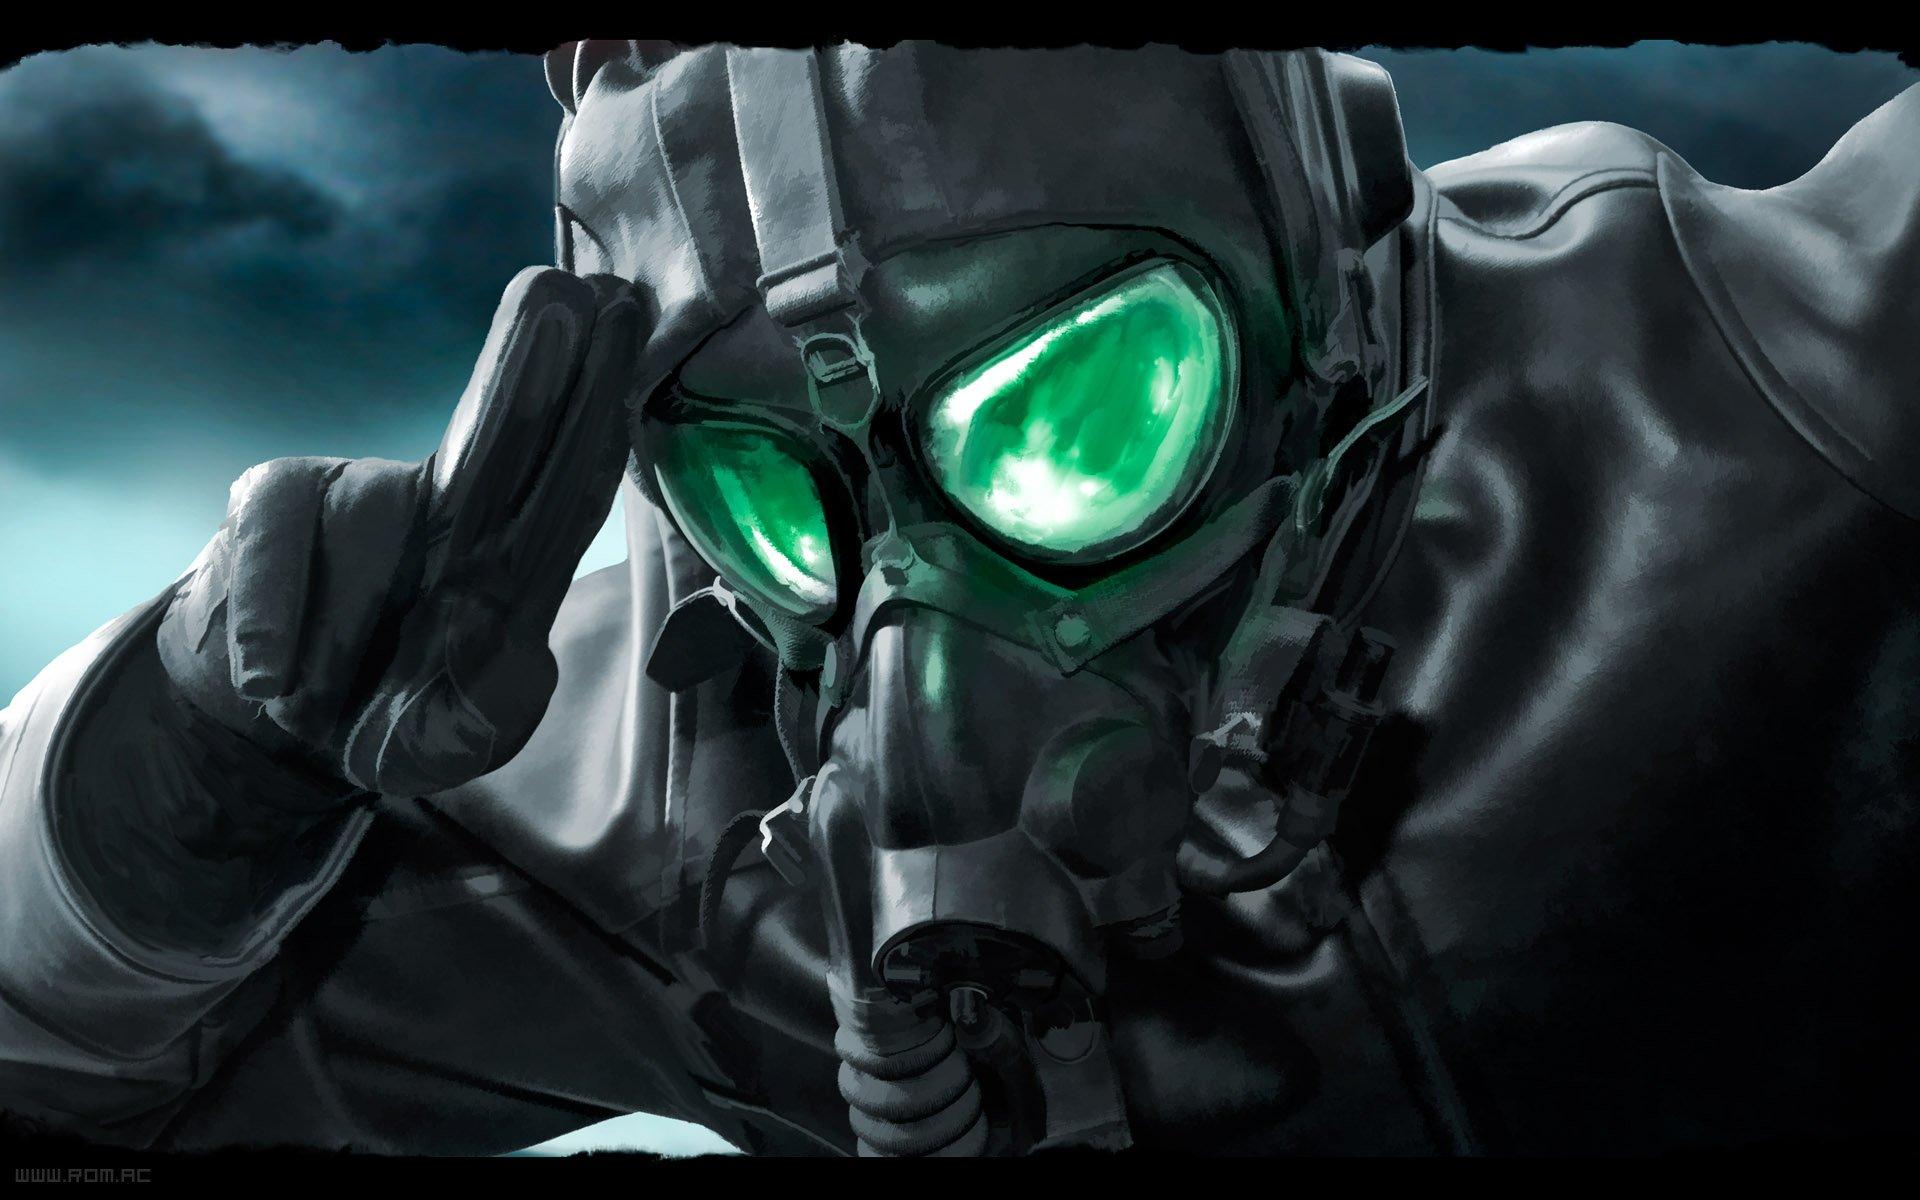 gas mask wallpaper 1920x1080